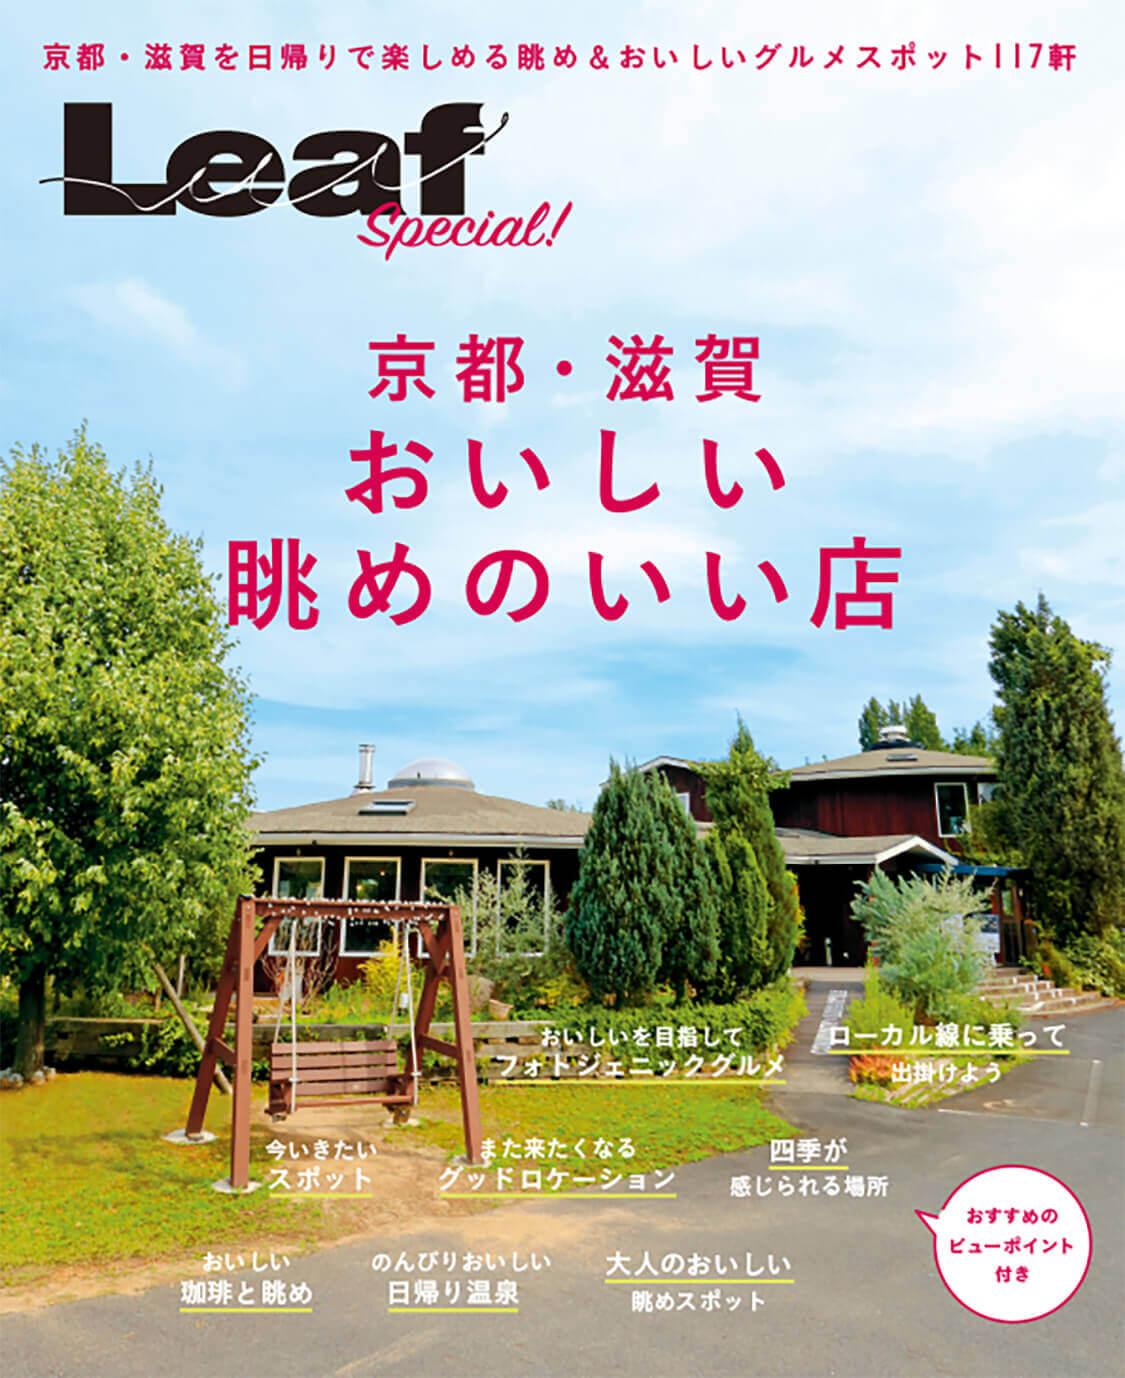 LeafMOOK 【書籍】京都・滋賀 おいしい眺めのいい店